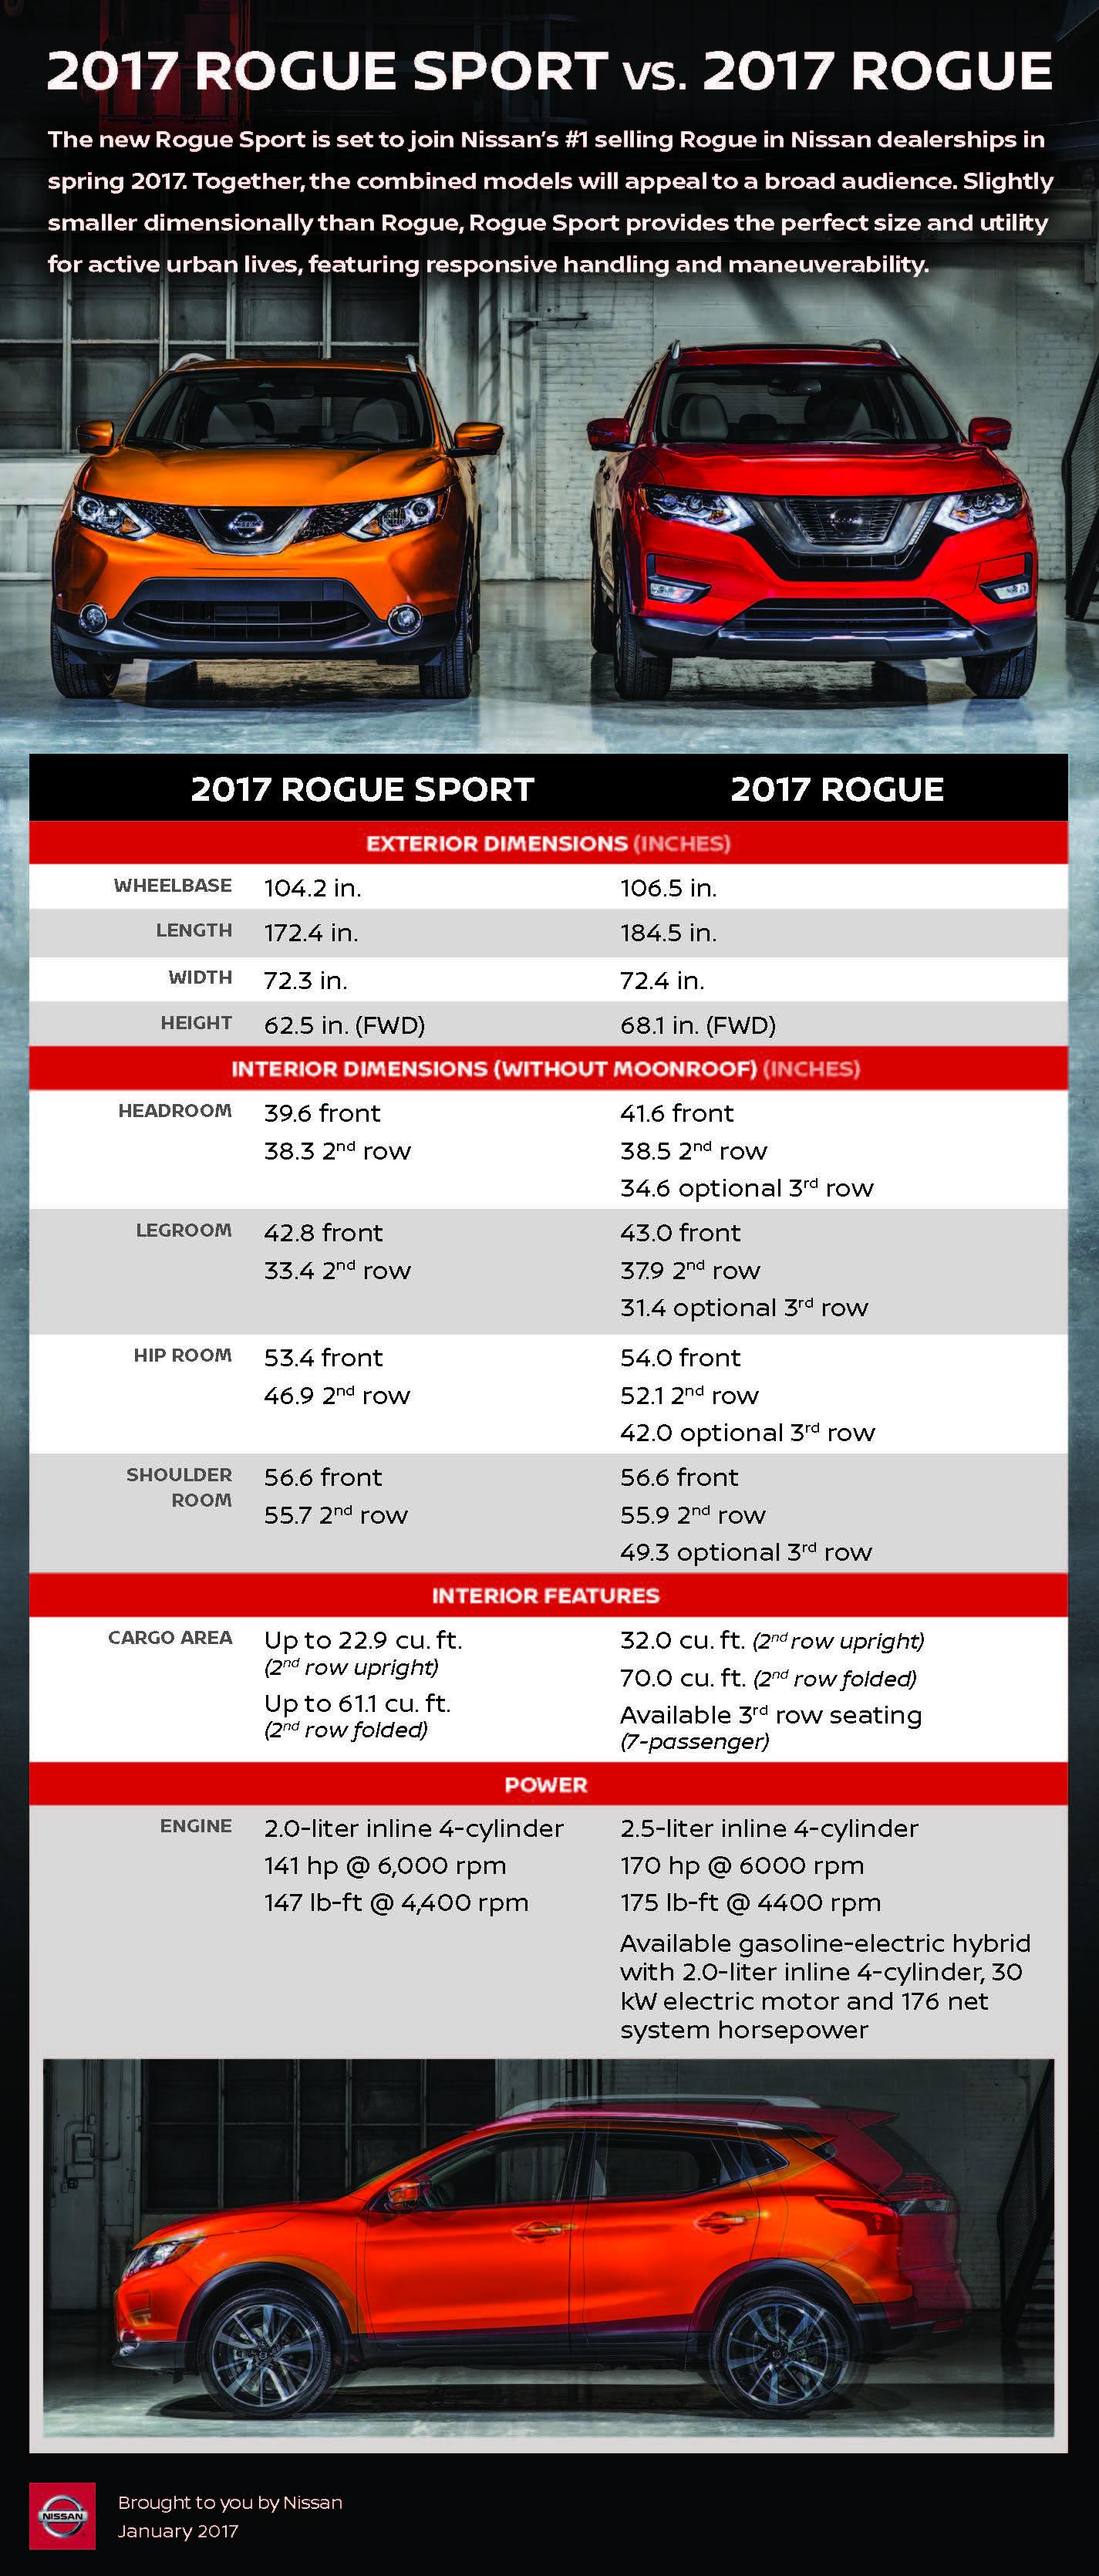 2017 Nissan Rogue Sport in Sylacauga AL at Serra Nissan of Sylacauga